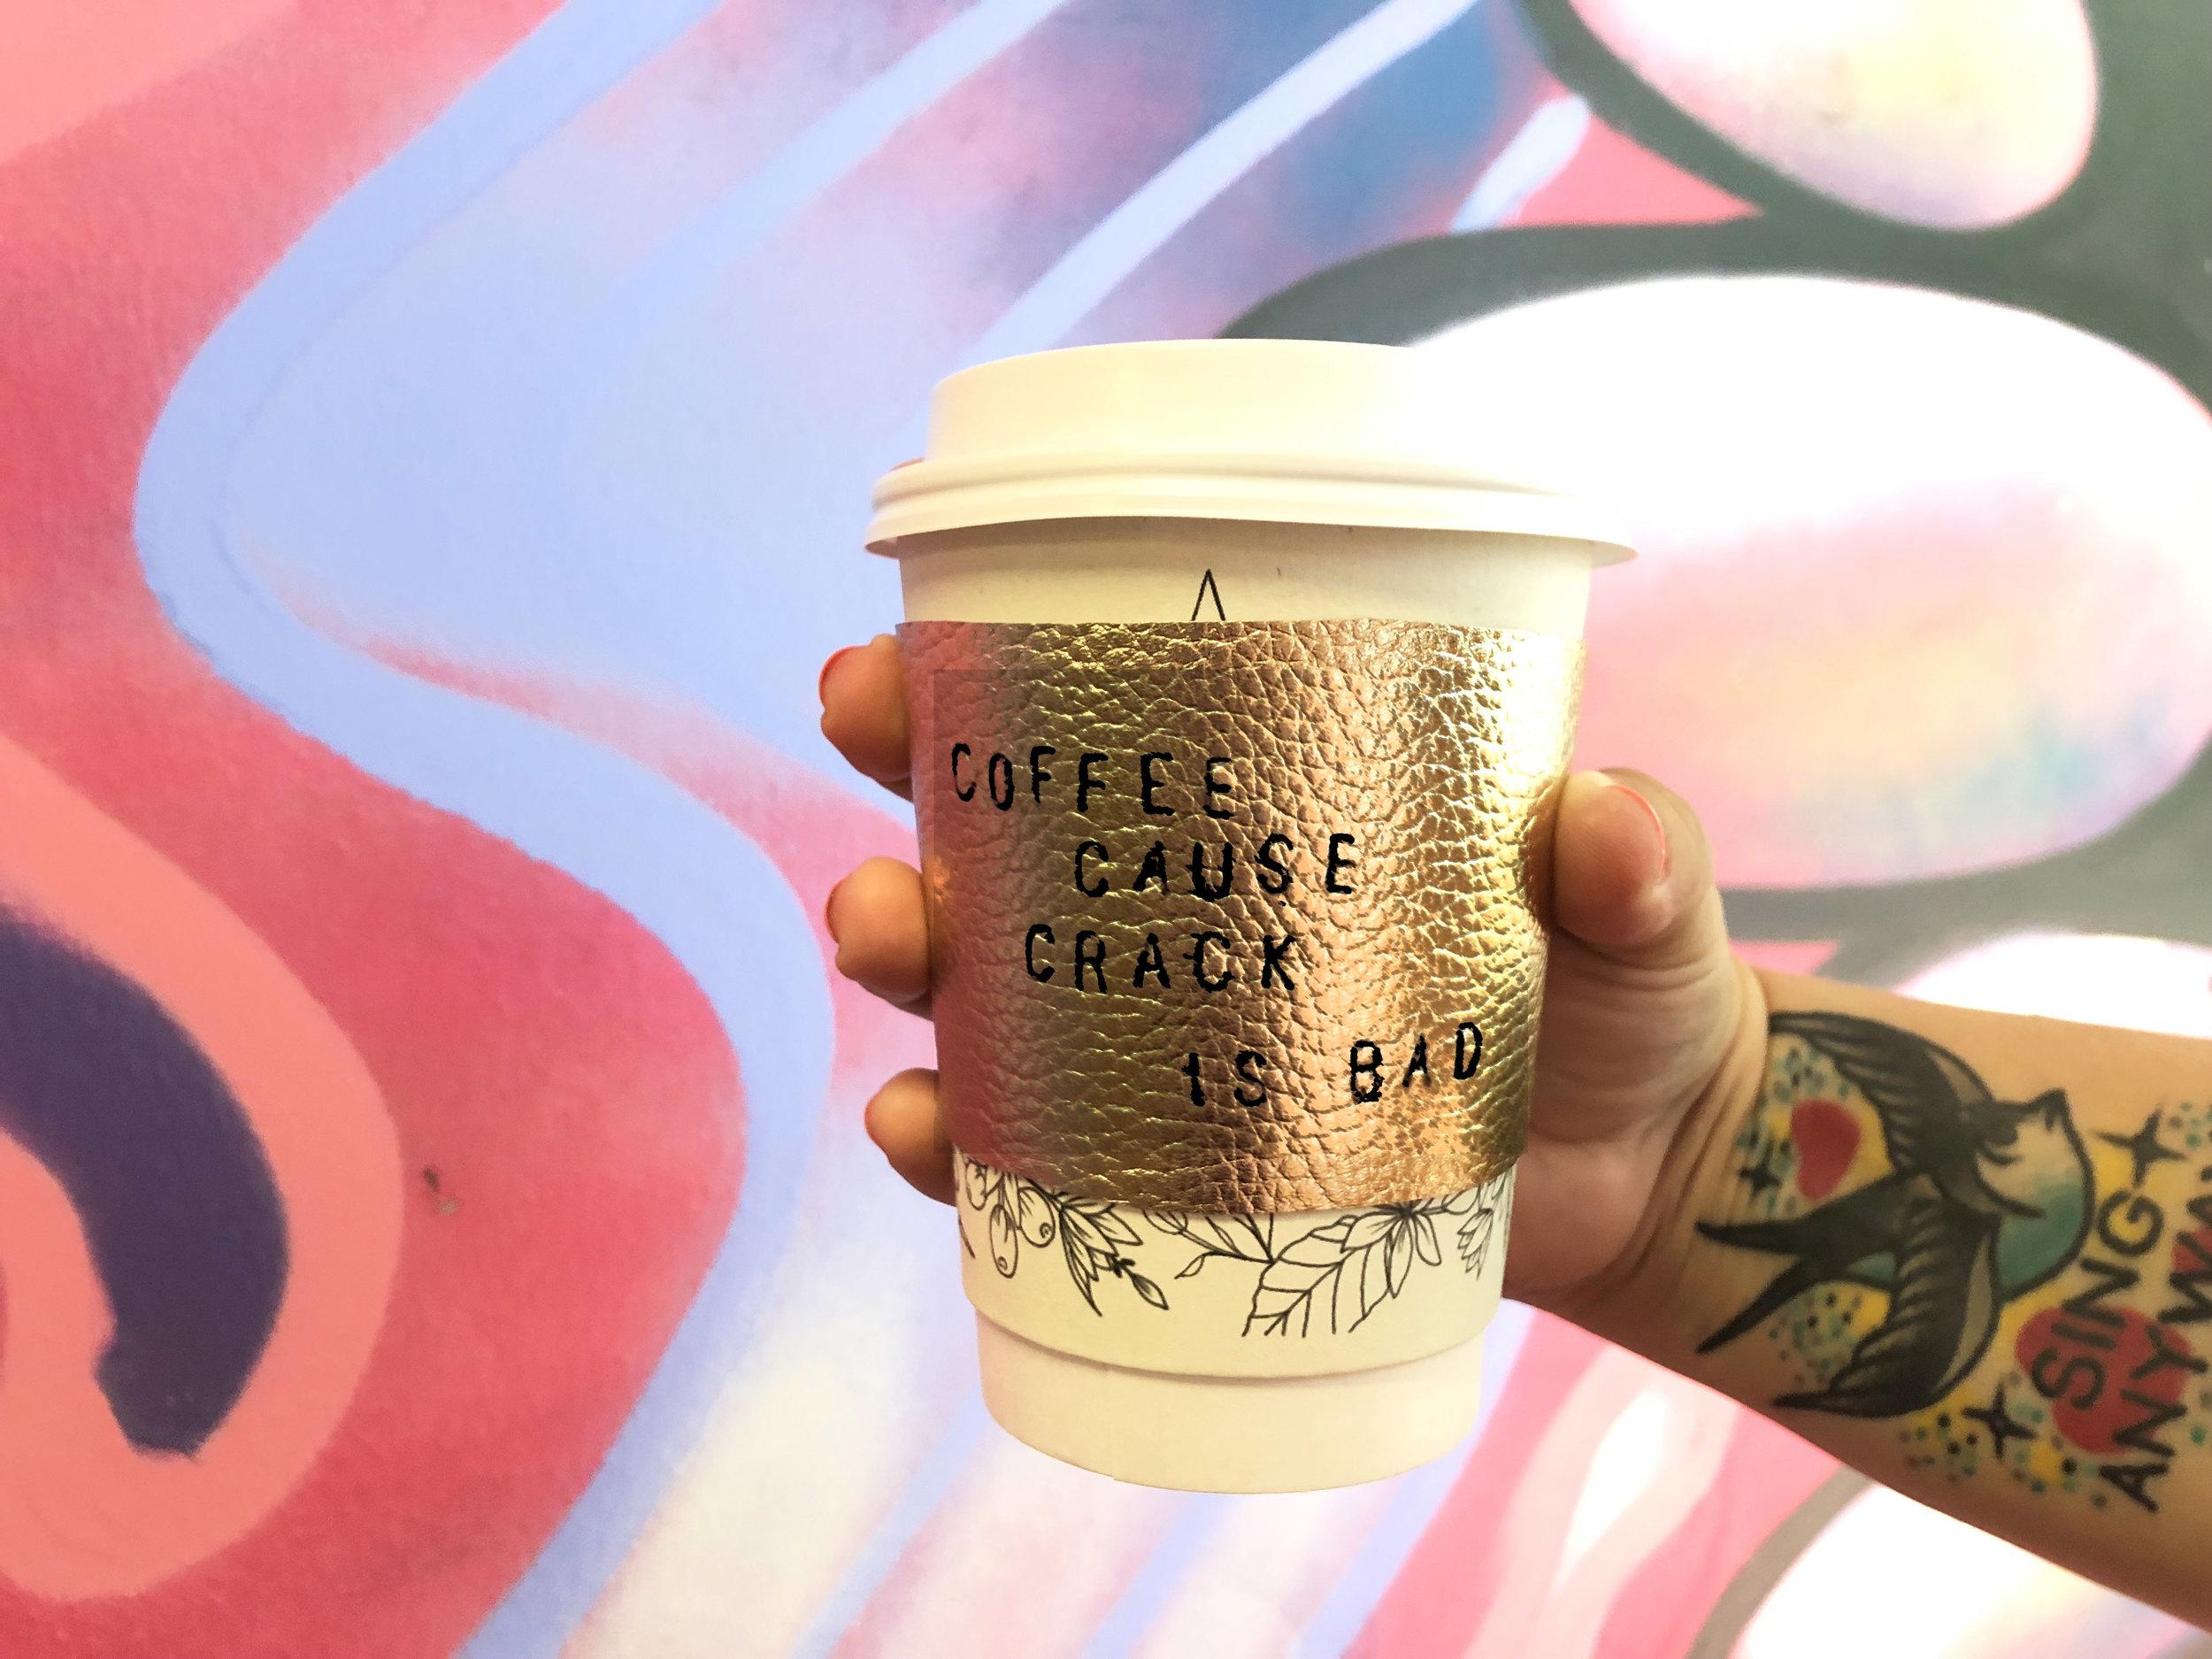 Coffee Sleeve Gold 4x3.jpg